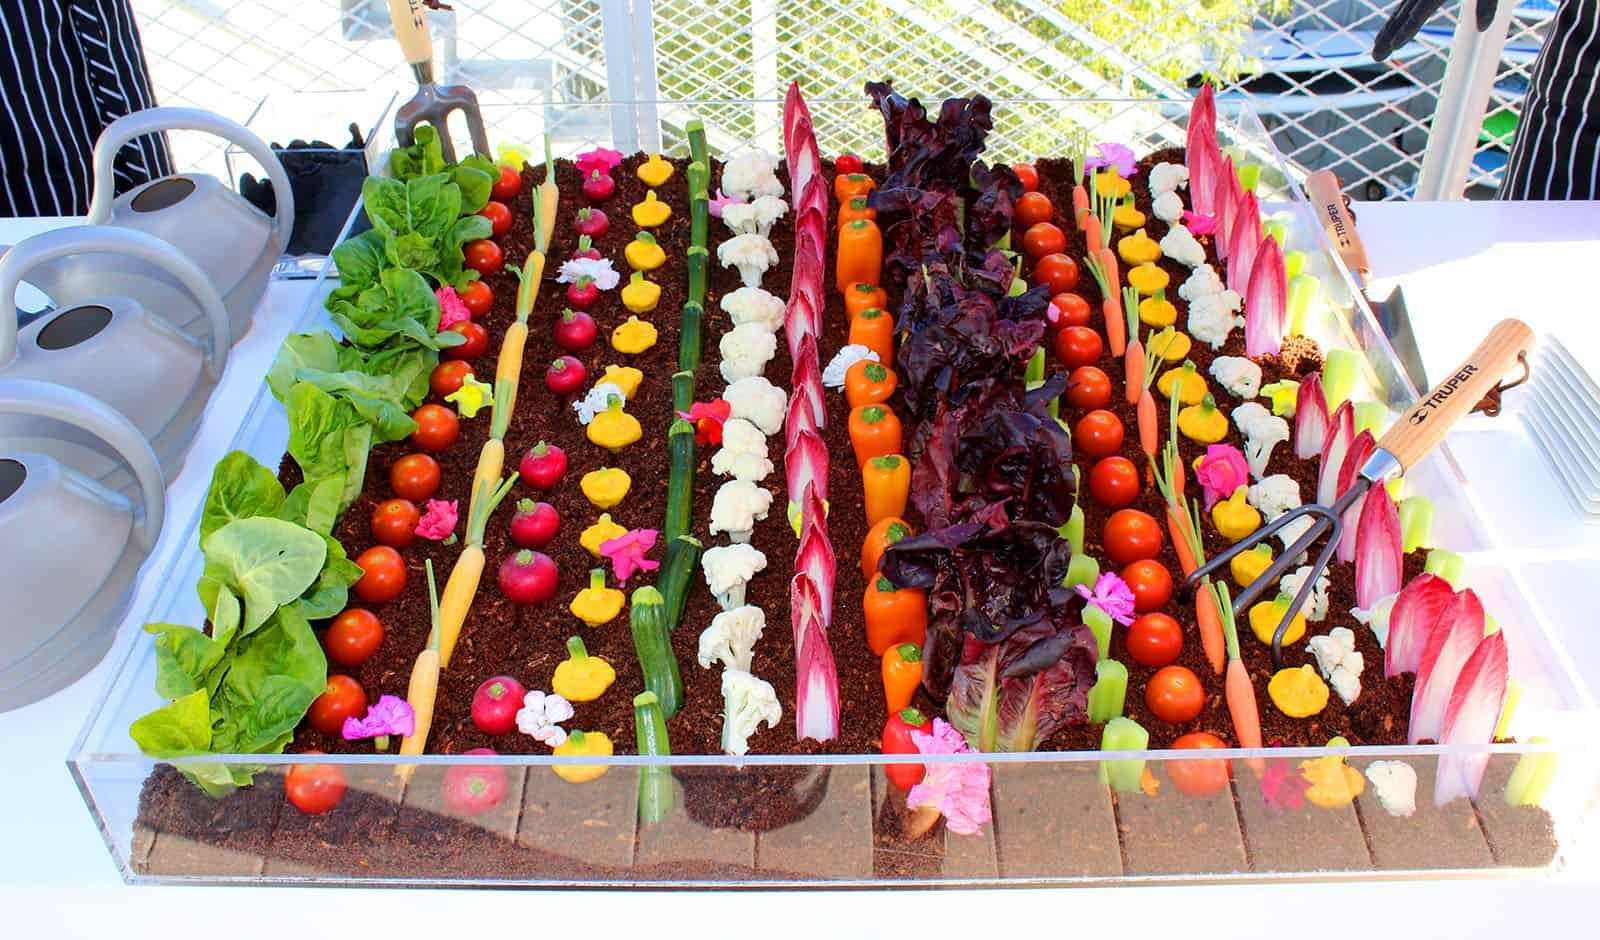 food-for-acne-vegan-vegetablesjpg